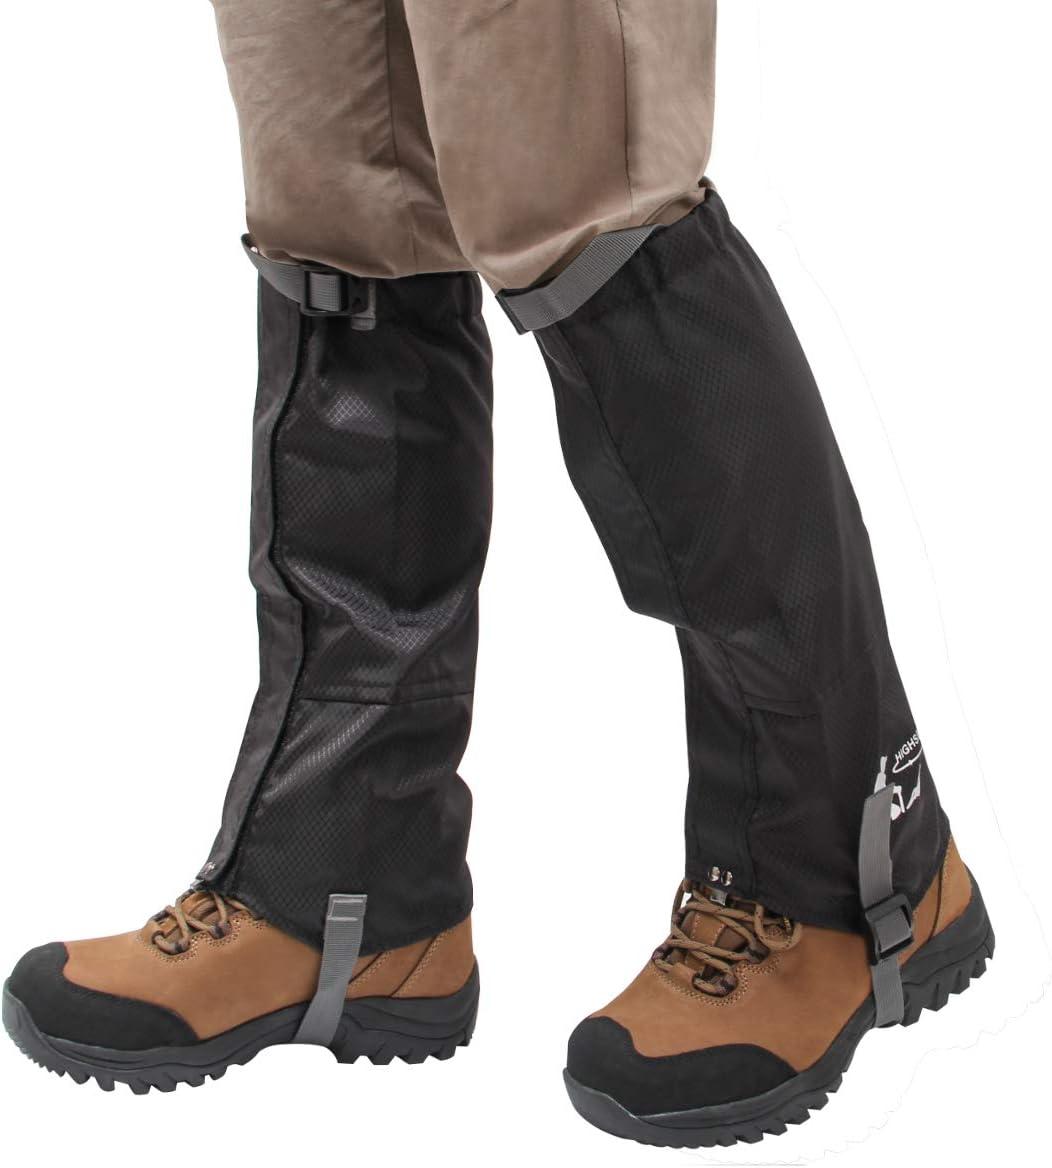 Luxiv Leg Gaiters Snow Boot Gaiter, Waterproof Men Leg Gaiters for Women Shoe Gaiters 600D Oxford Fabric Outdoor Snowshoe Gaiter for Hiking, Climbing, Running